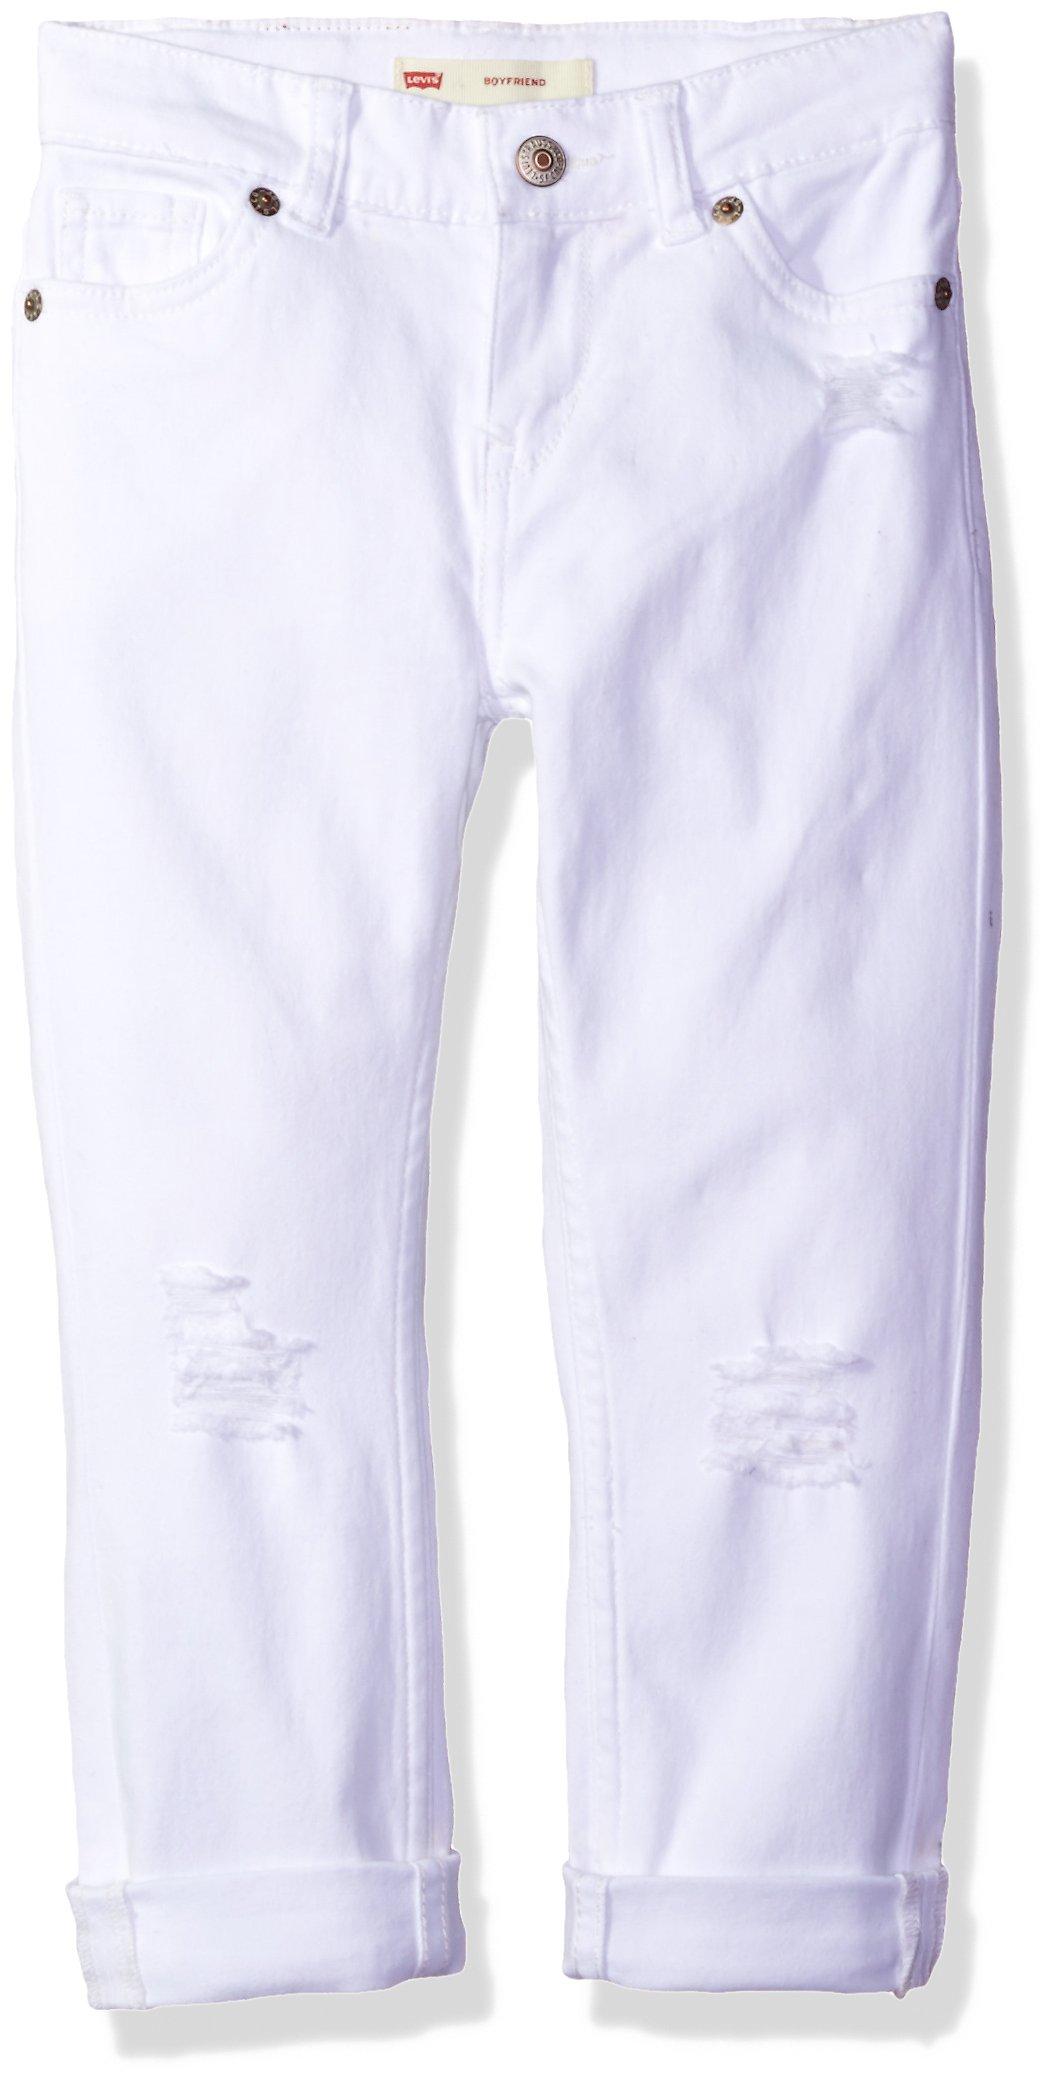 Levi's Little Girls' Distressed Boyfriend Fit Jeans, White with Destruction, 6X